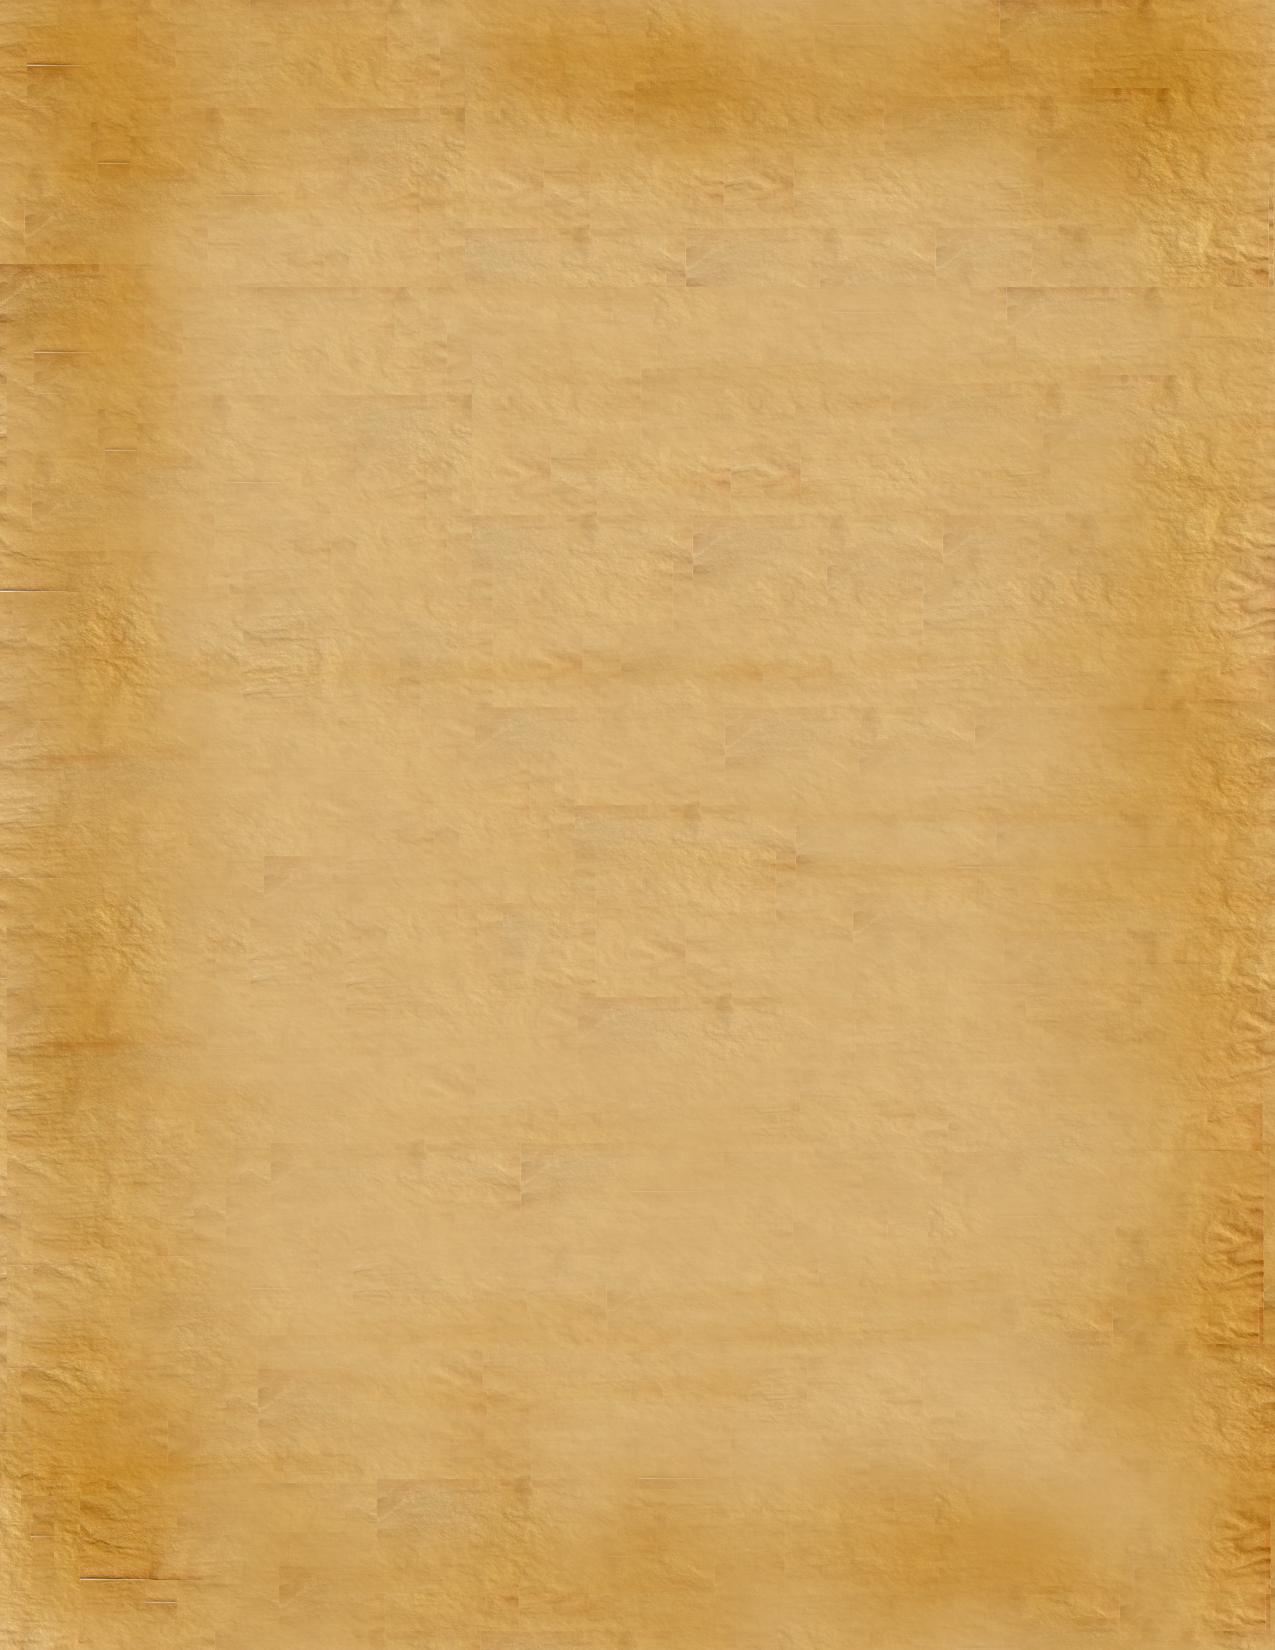 photograph about Parchment Paper Printable known as 17 Free of charge Parchment Paper Template Photos - Previous Parchment